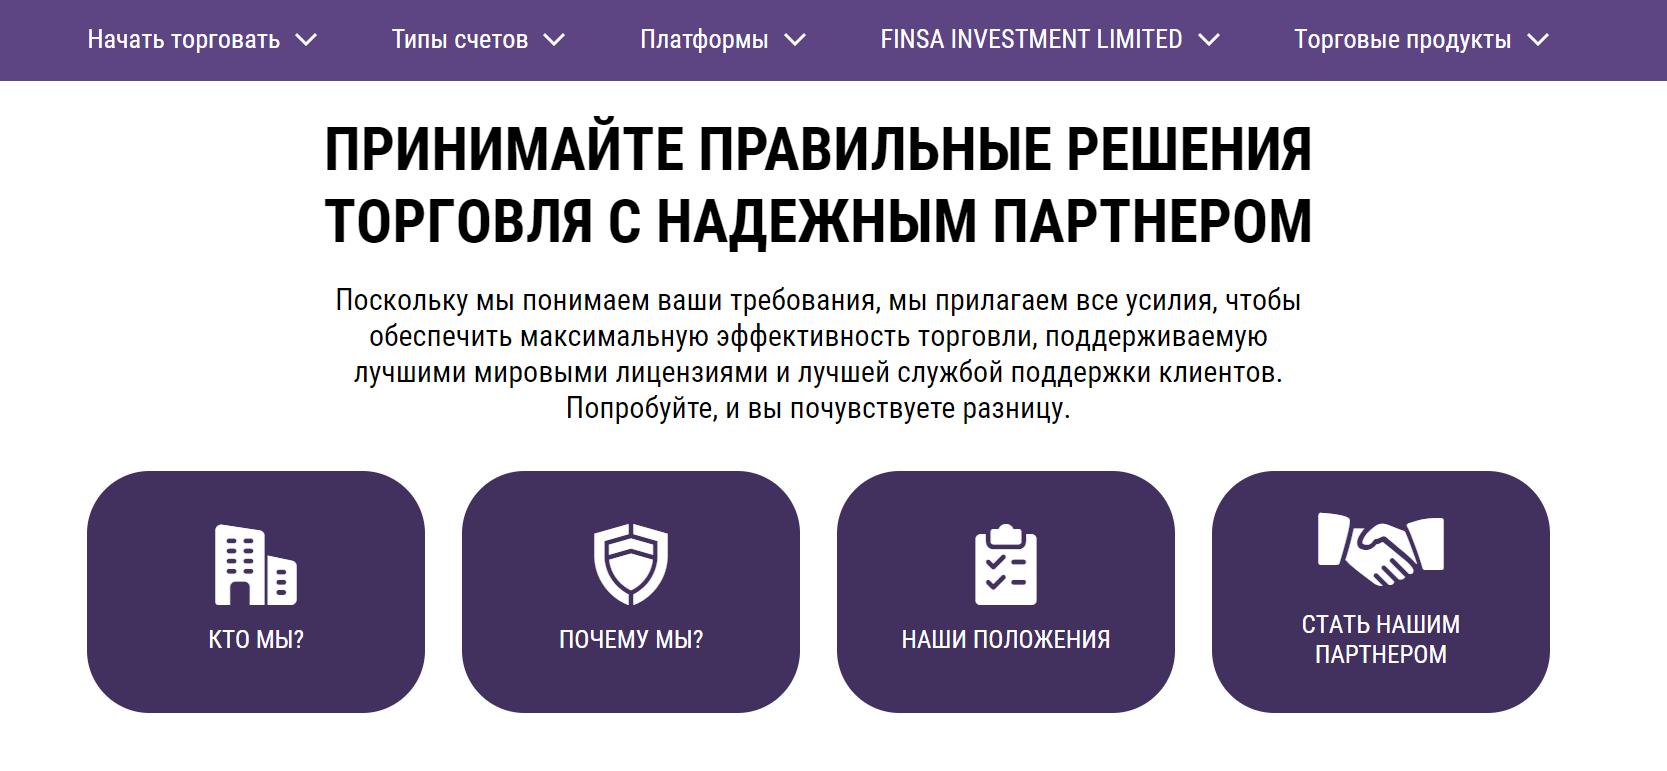 сайт мошенника finsa investment limited